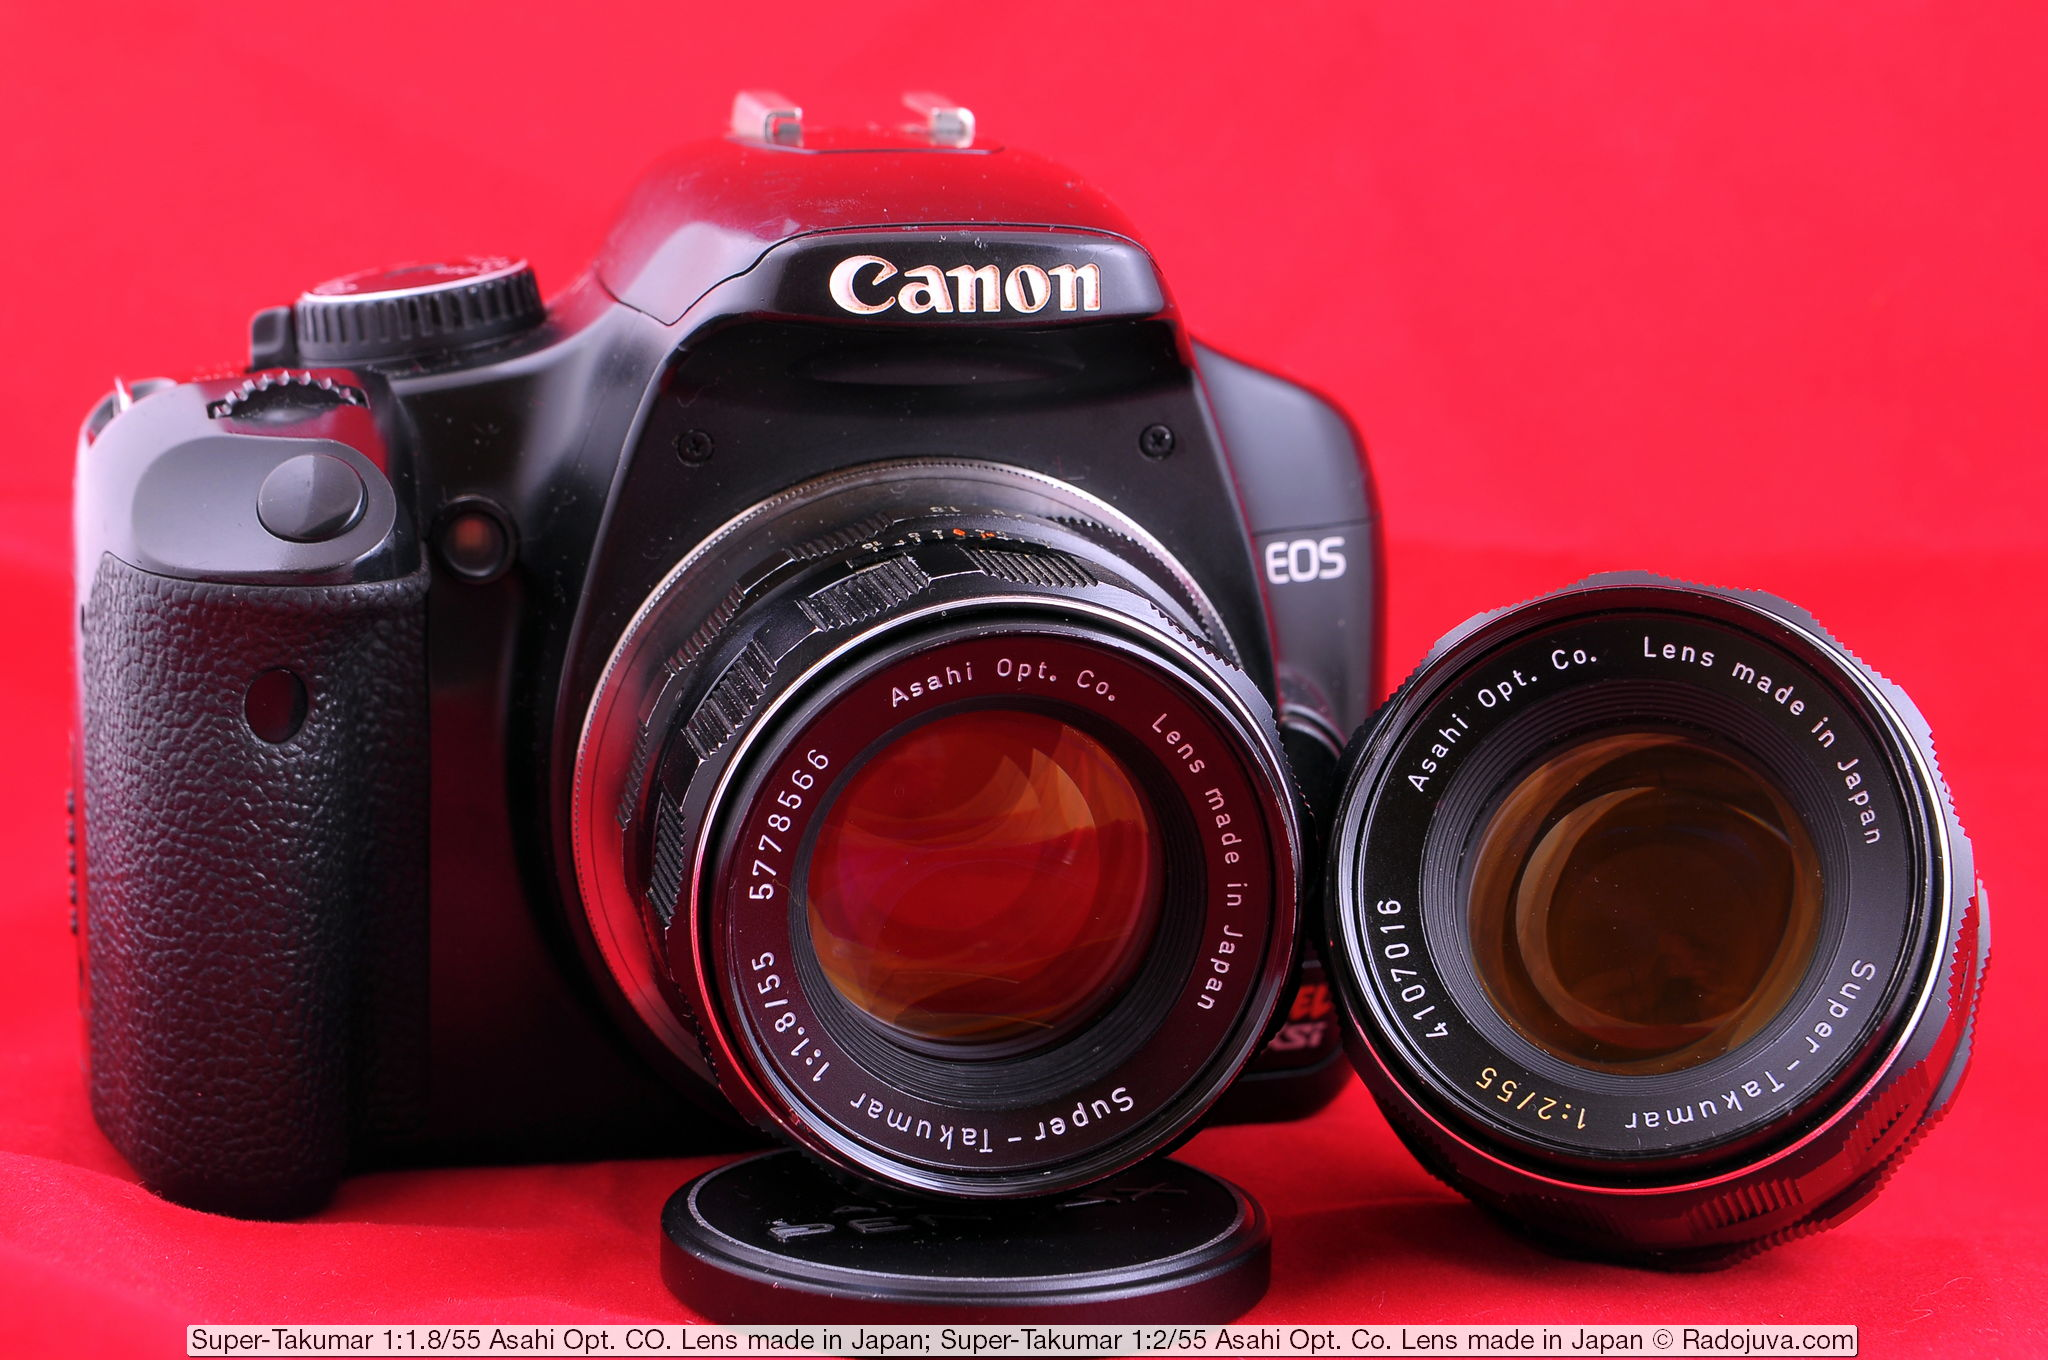 Объектив Super-Takumar 1:1.8/55 Asahi Opt. Co. Lens made in Japa на цифровом зеркальном фотоаппарате Canon EOS DIGITAL Rebel XSi. Установка объектива на фотоаппарат осуществлена с помощью переходника M42-Canon EOS с чипом. Рядом находится объектив Super-Takumar 1:2/55 Asahi Opt. Co. Lens made in Japan